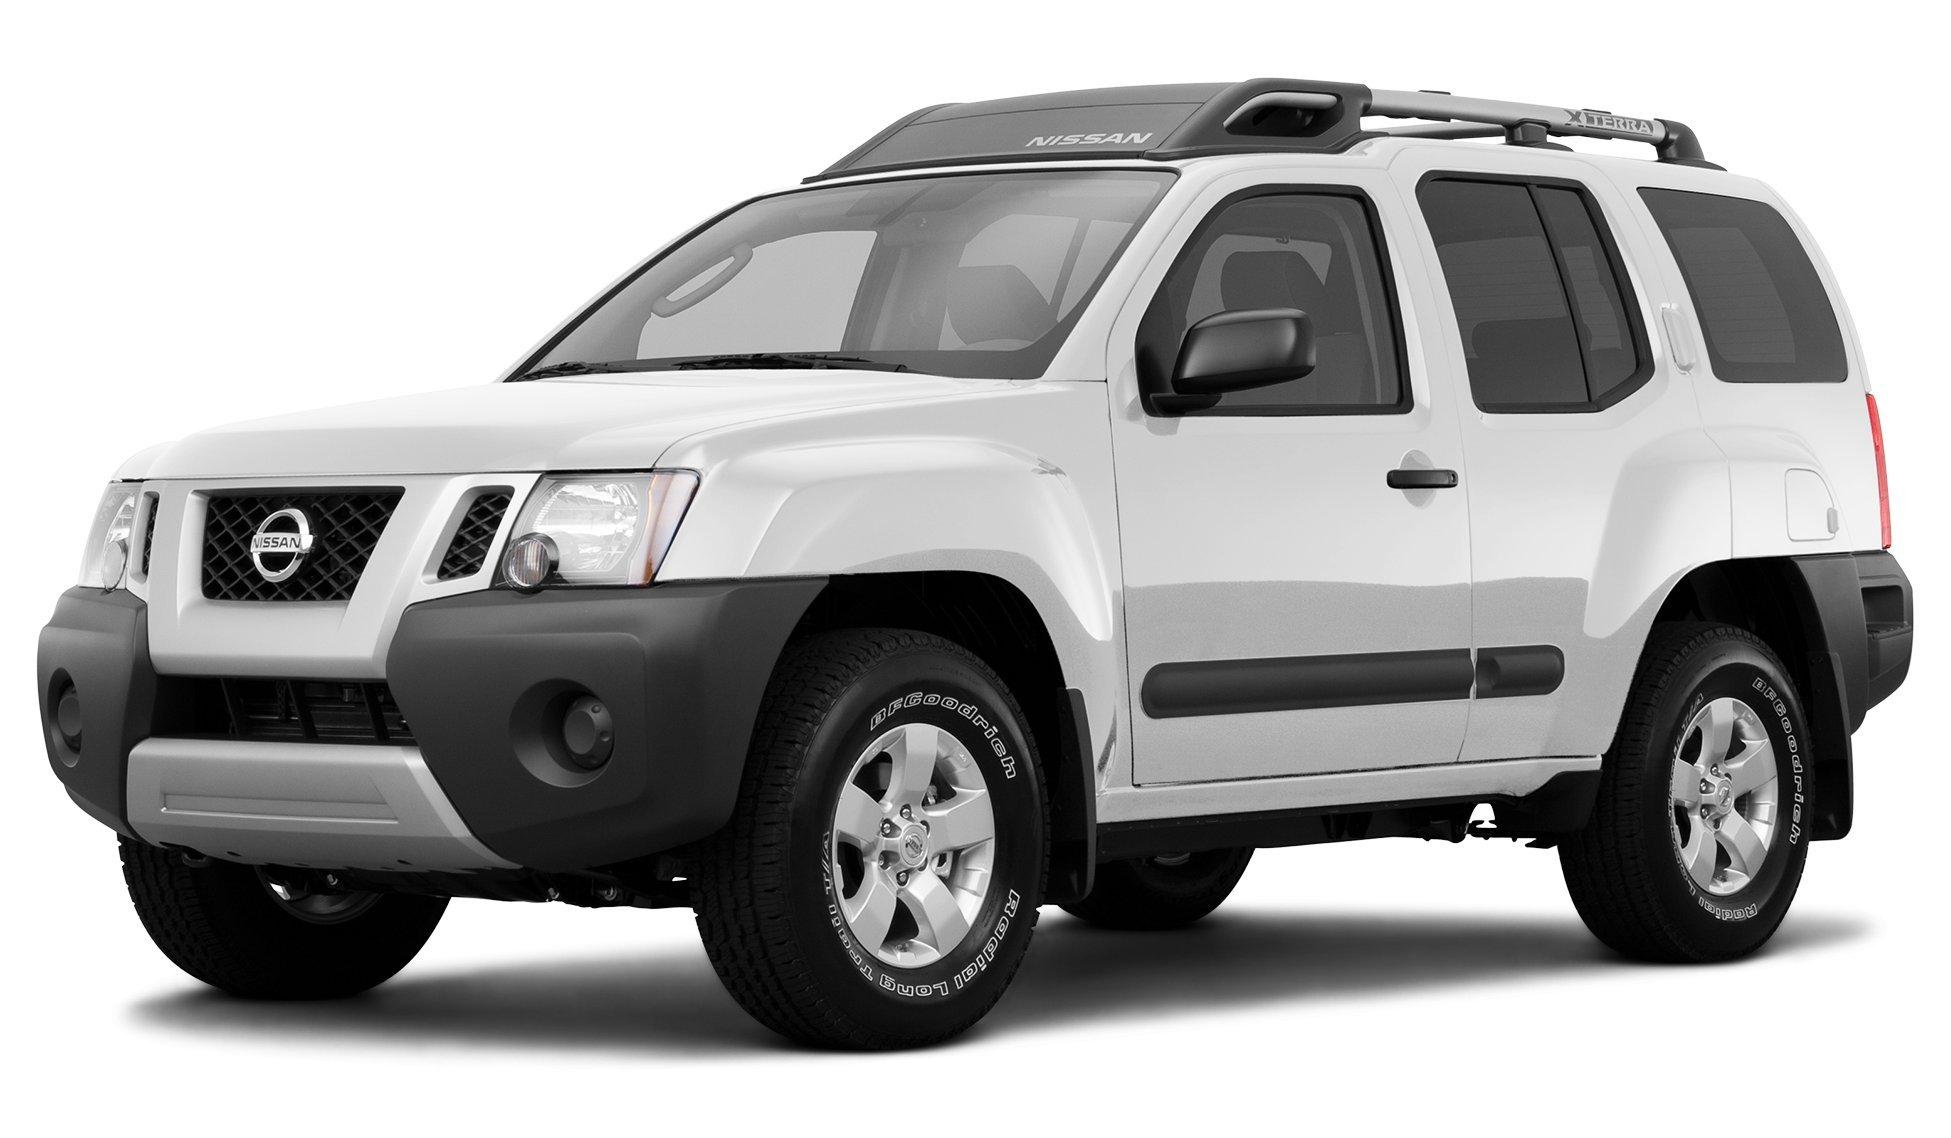 2011 Nissan Xterra Pro 4X, 4 Wheel Drive 4 Door Automatic Transmission ...